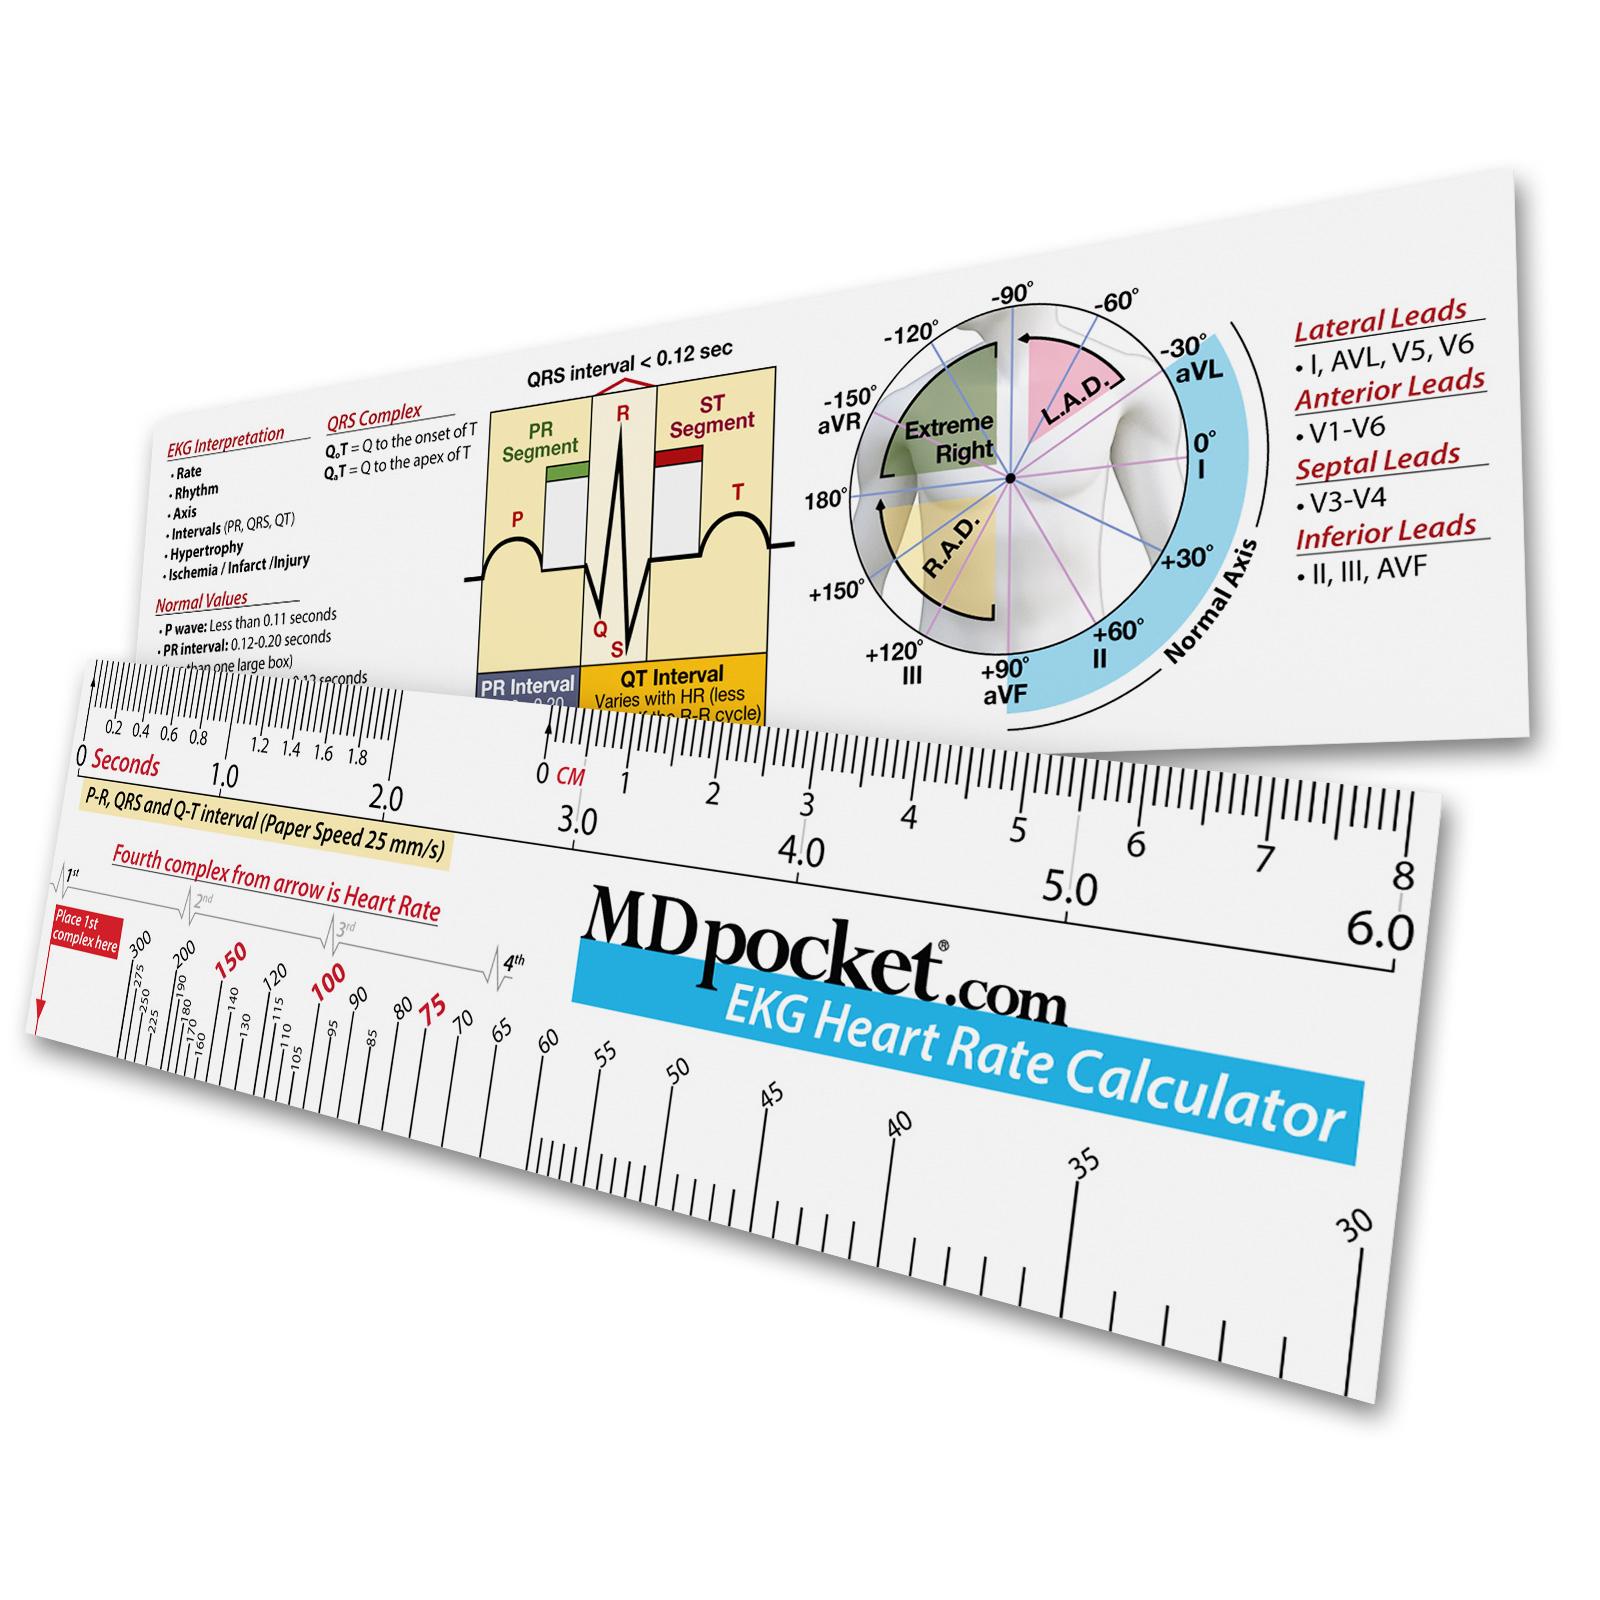 Ekg Heart Rate Calculator Ruler